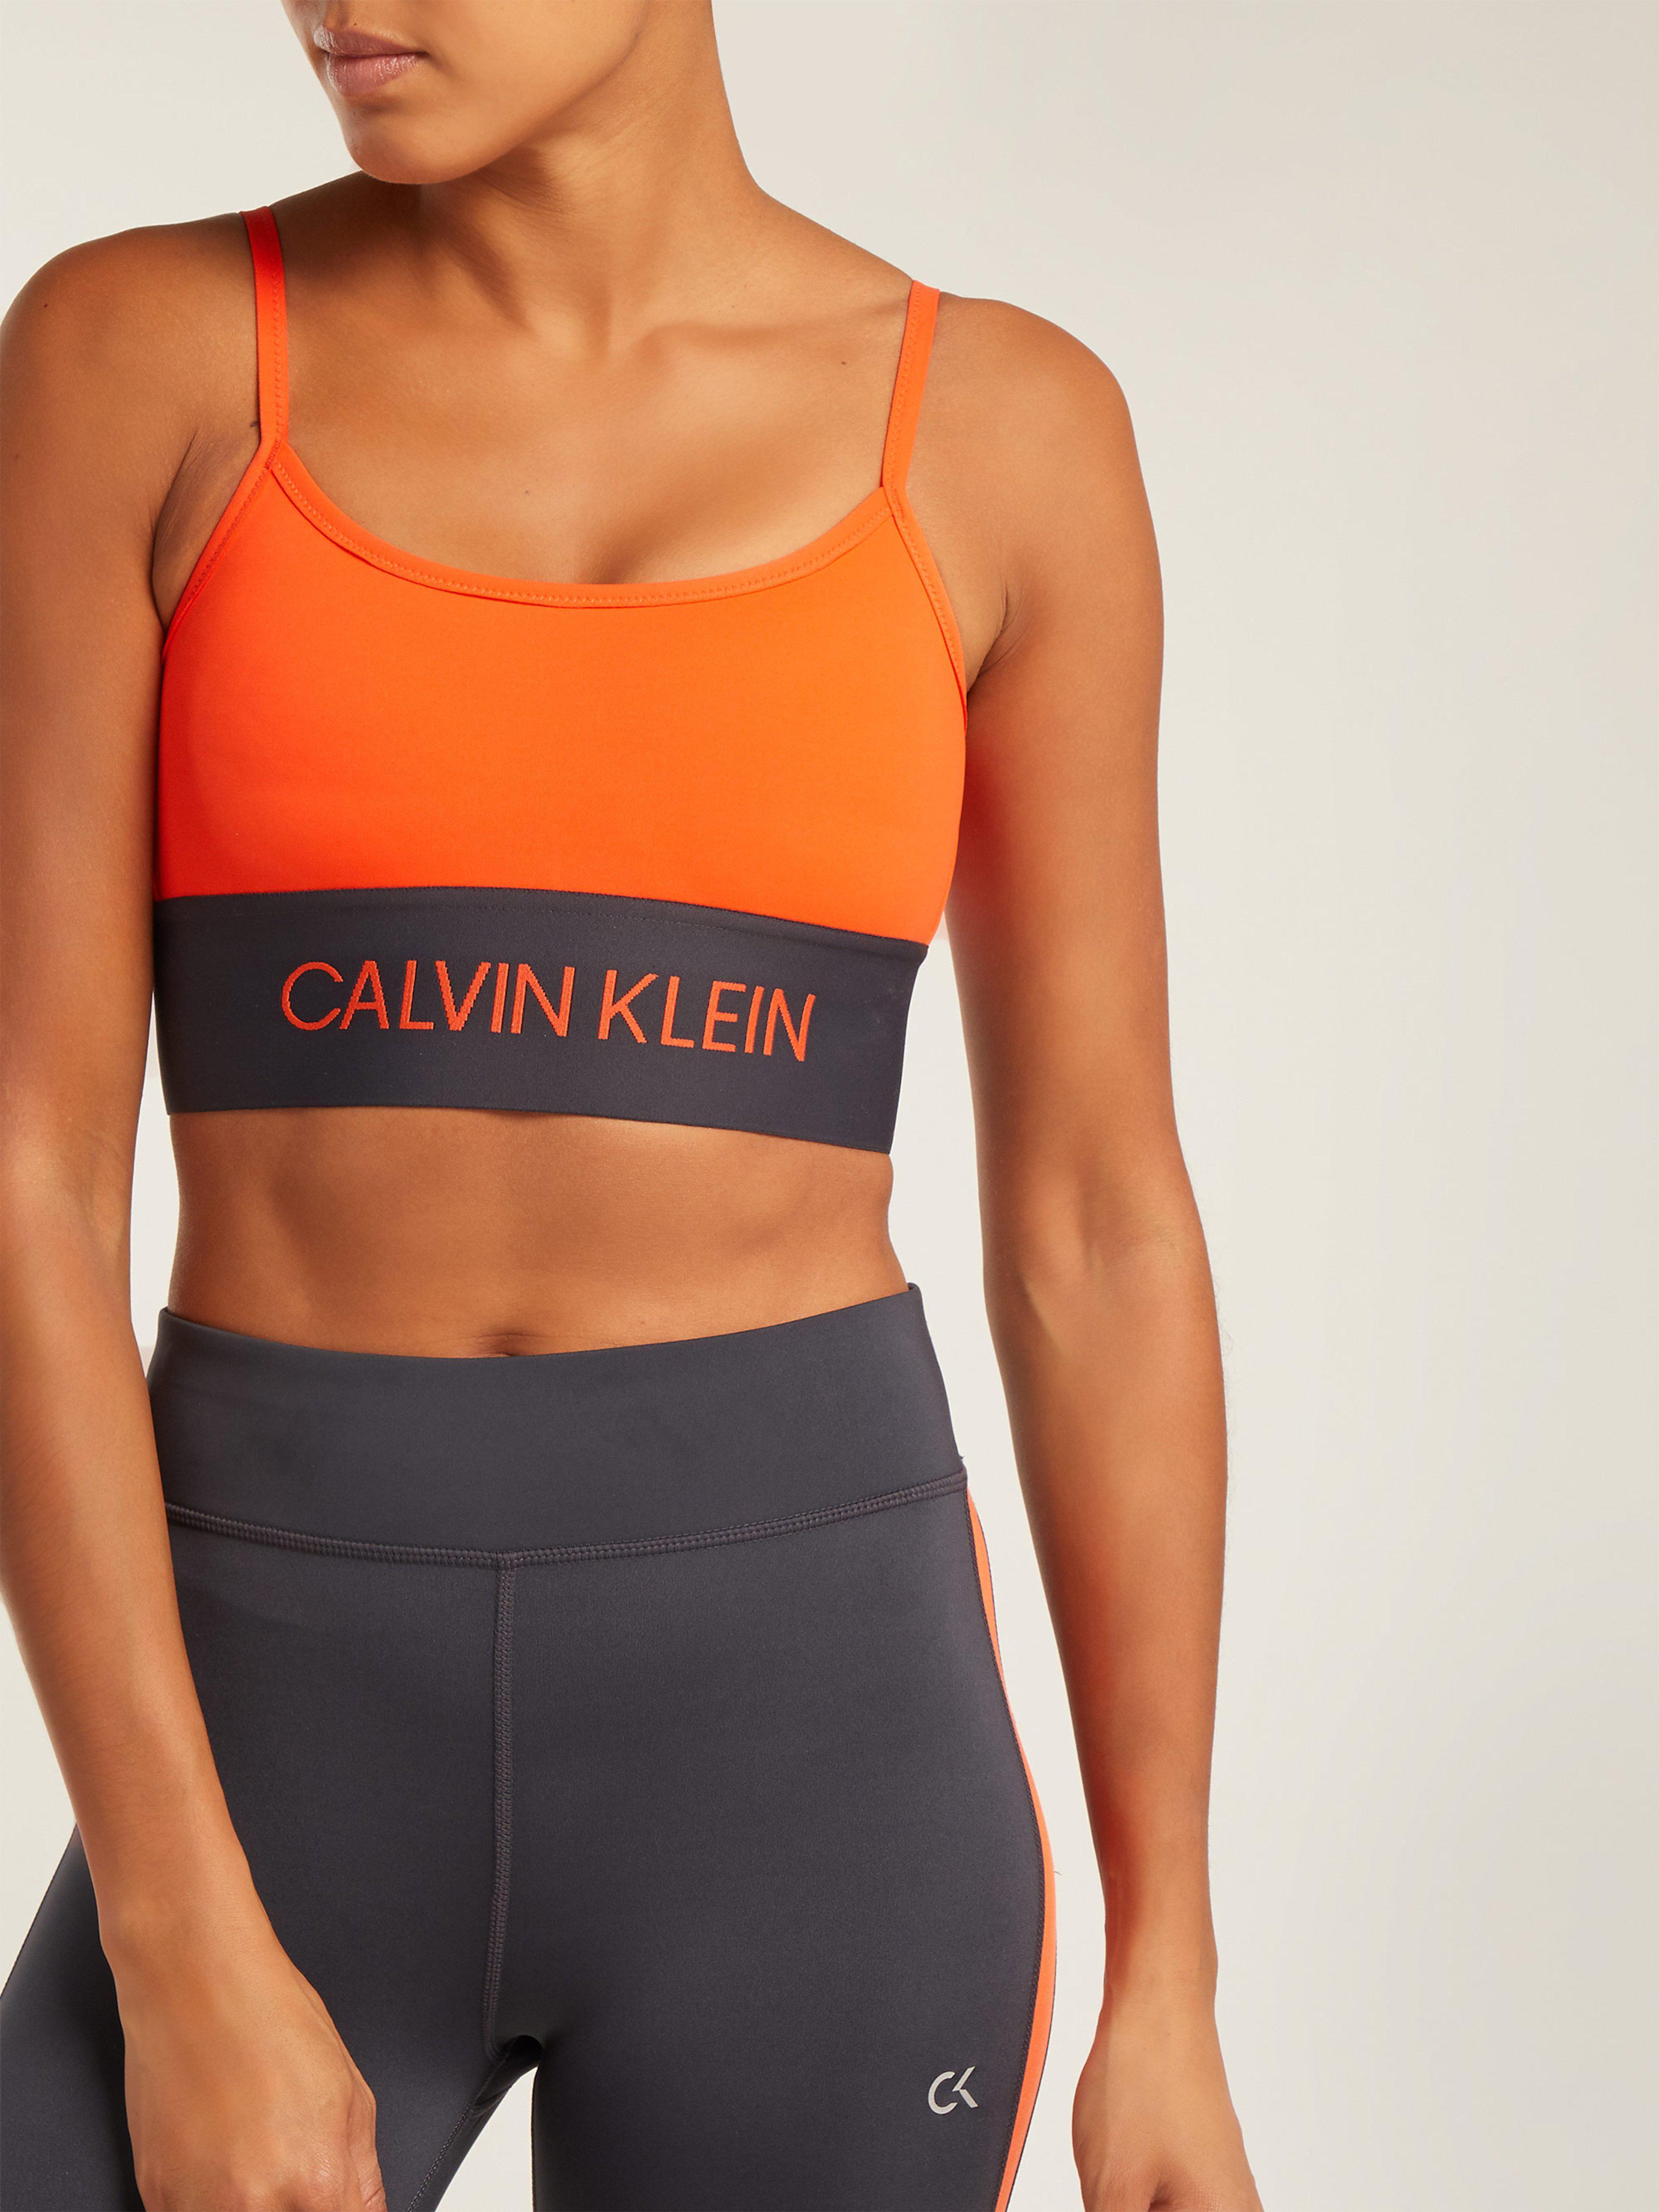 cd038de2a4e Calvin Klein Logo Jacquard Sports Bra in Orange - Save 40% - Lyst